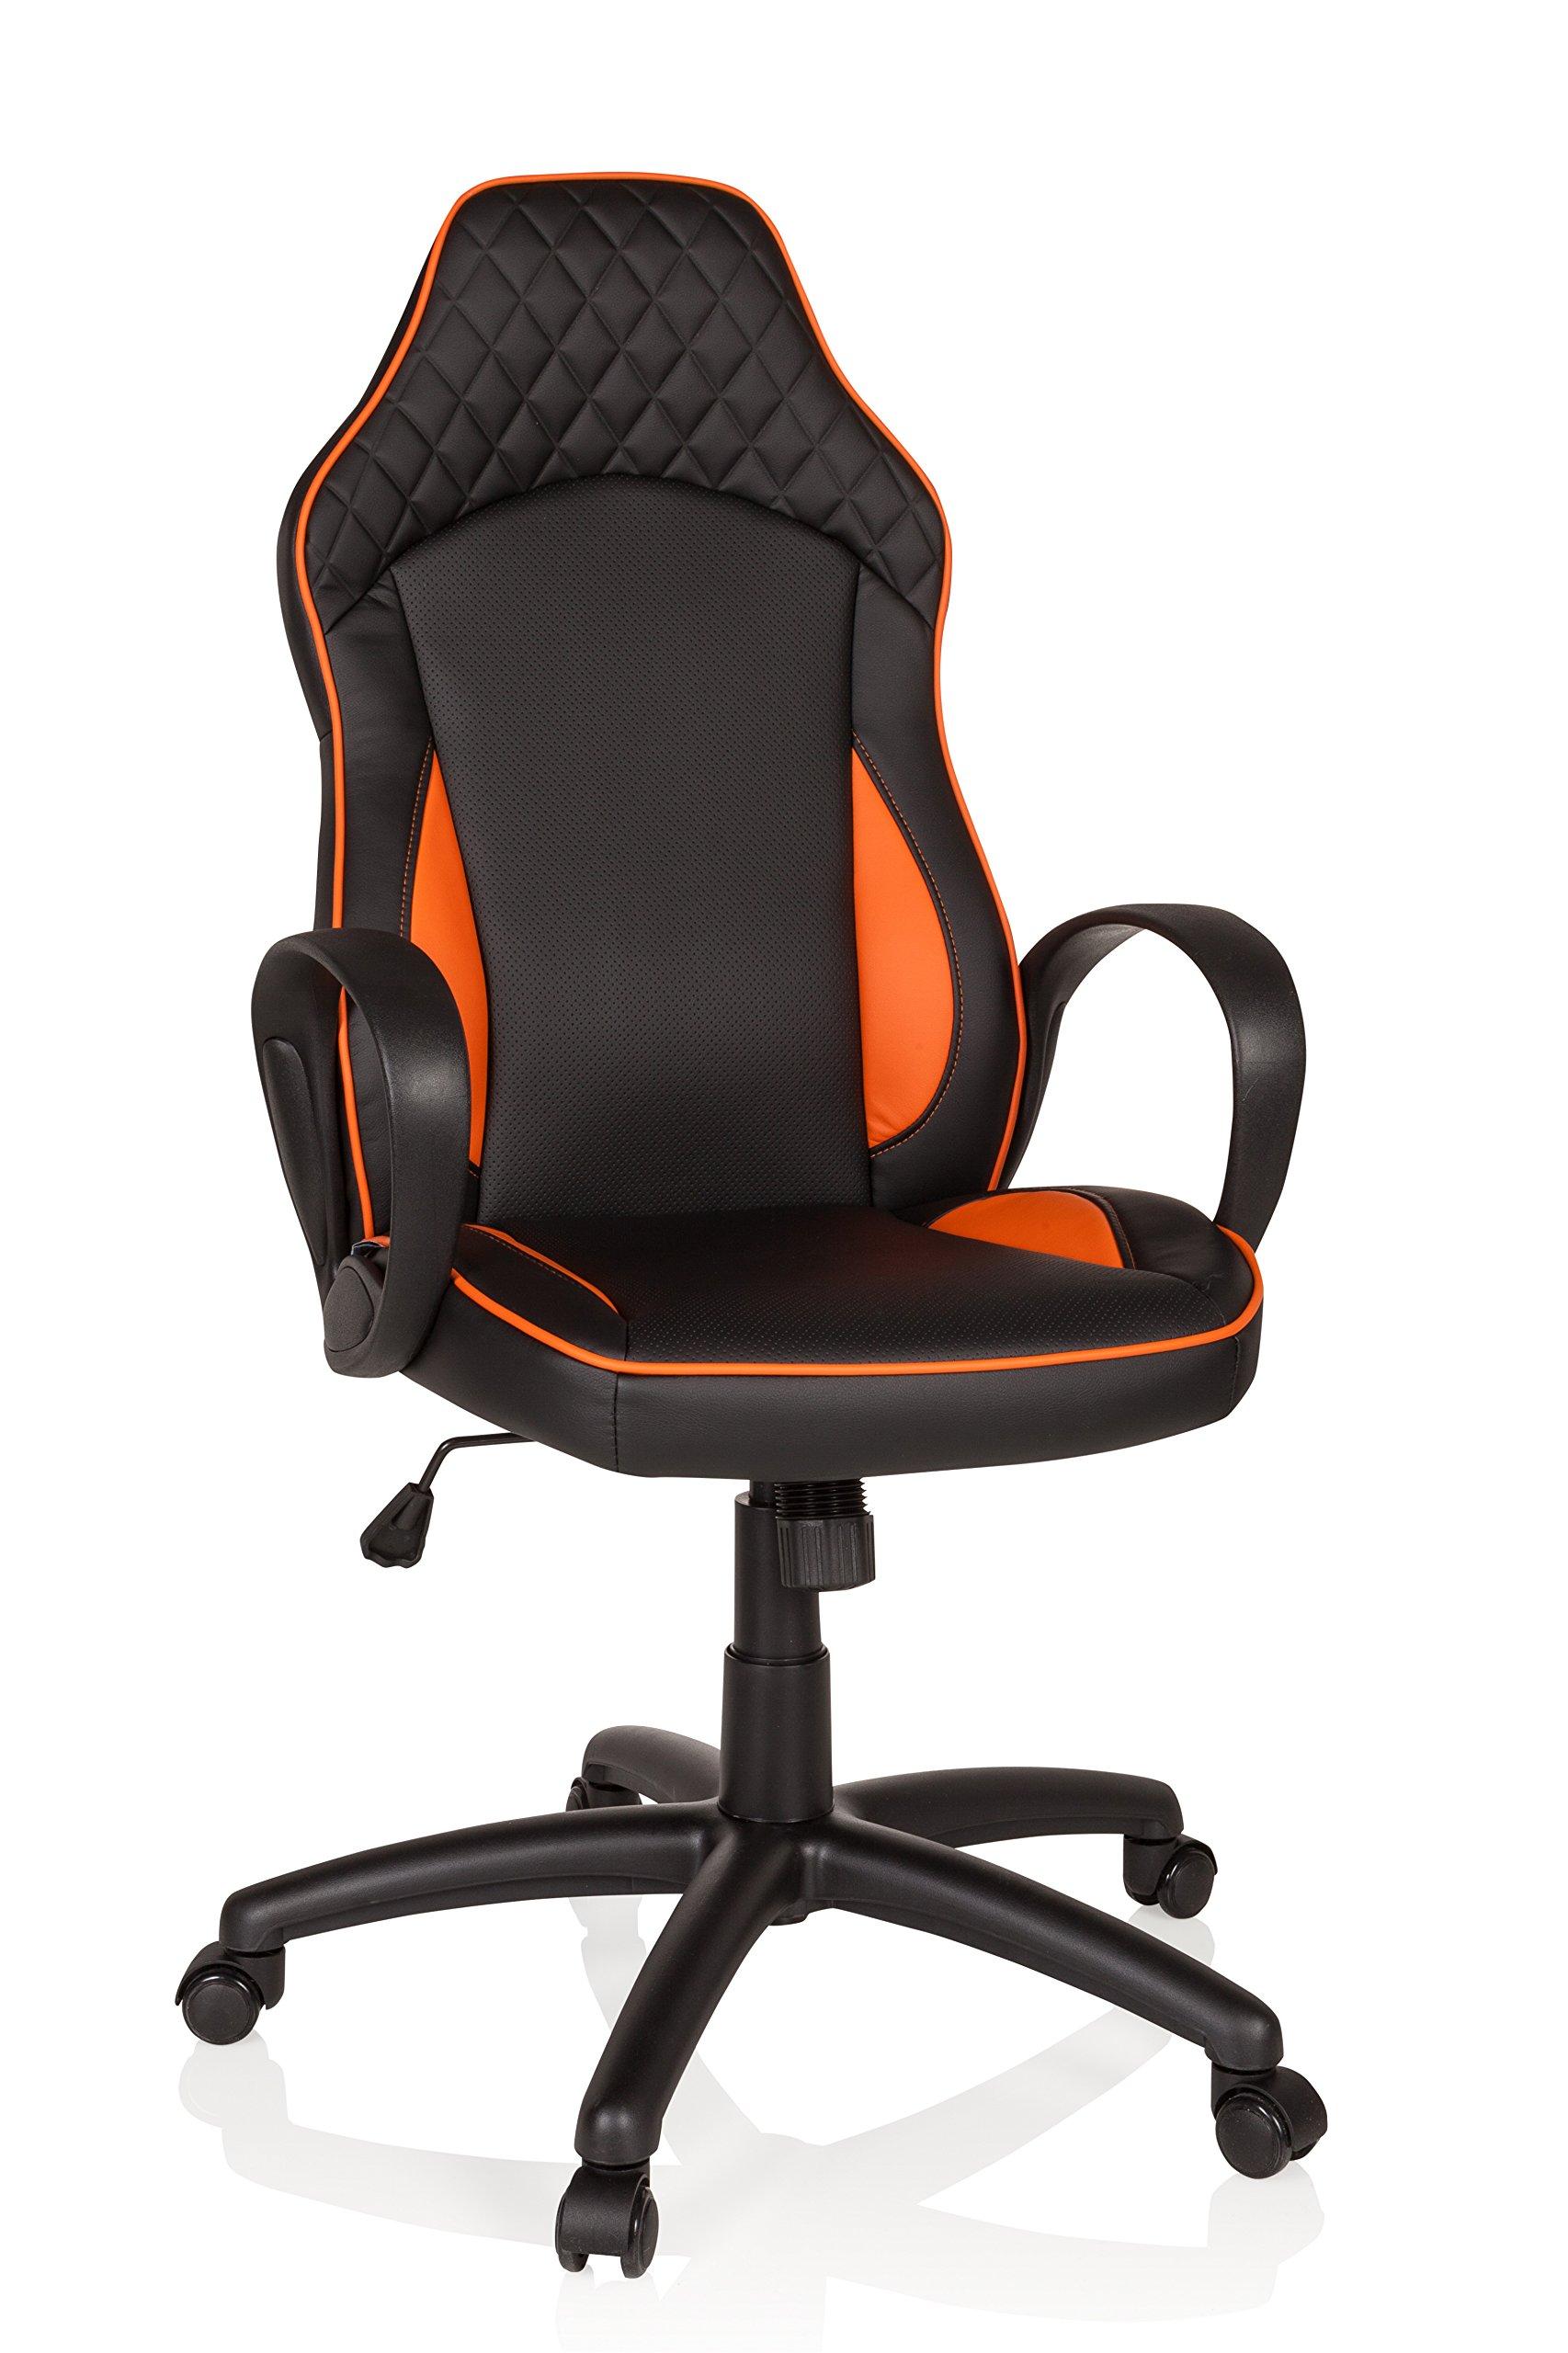 hjh OFFICE 621948 Silla Gaming BAZA Piel sintética Negro/Naranja Silla de Oficina Silla Racing